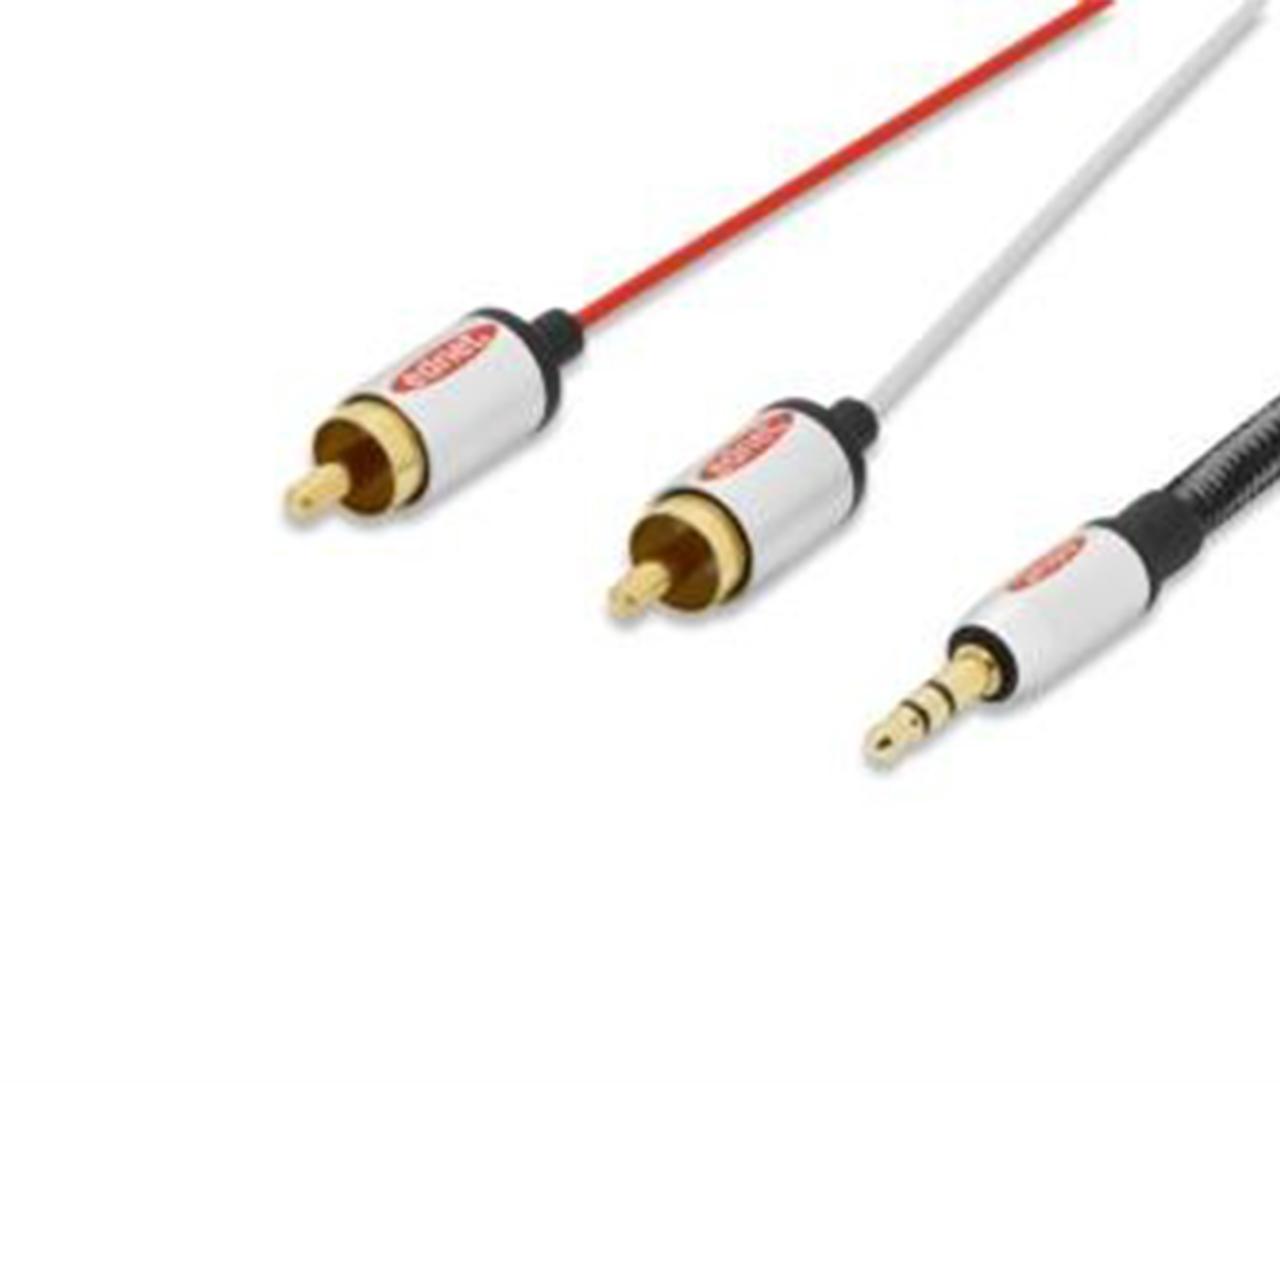 Buy Ednet 84542, Audio Premium Cable, Stereo, 3.5mm, 2X RCA, M/M ...